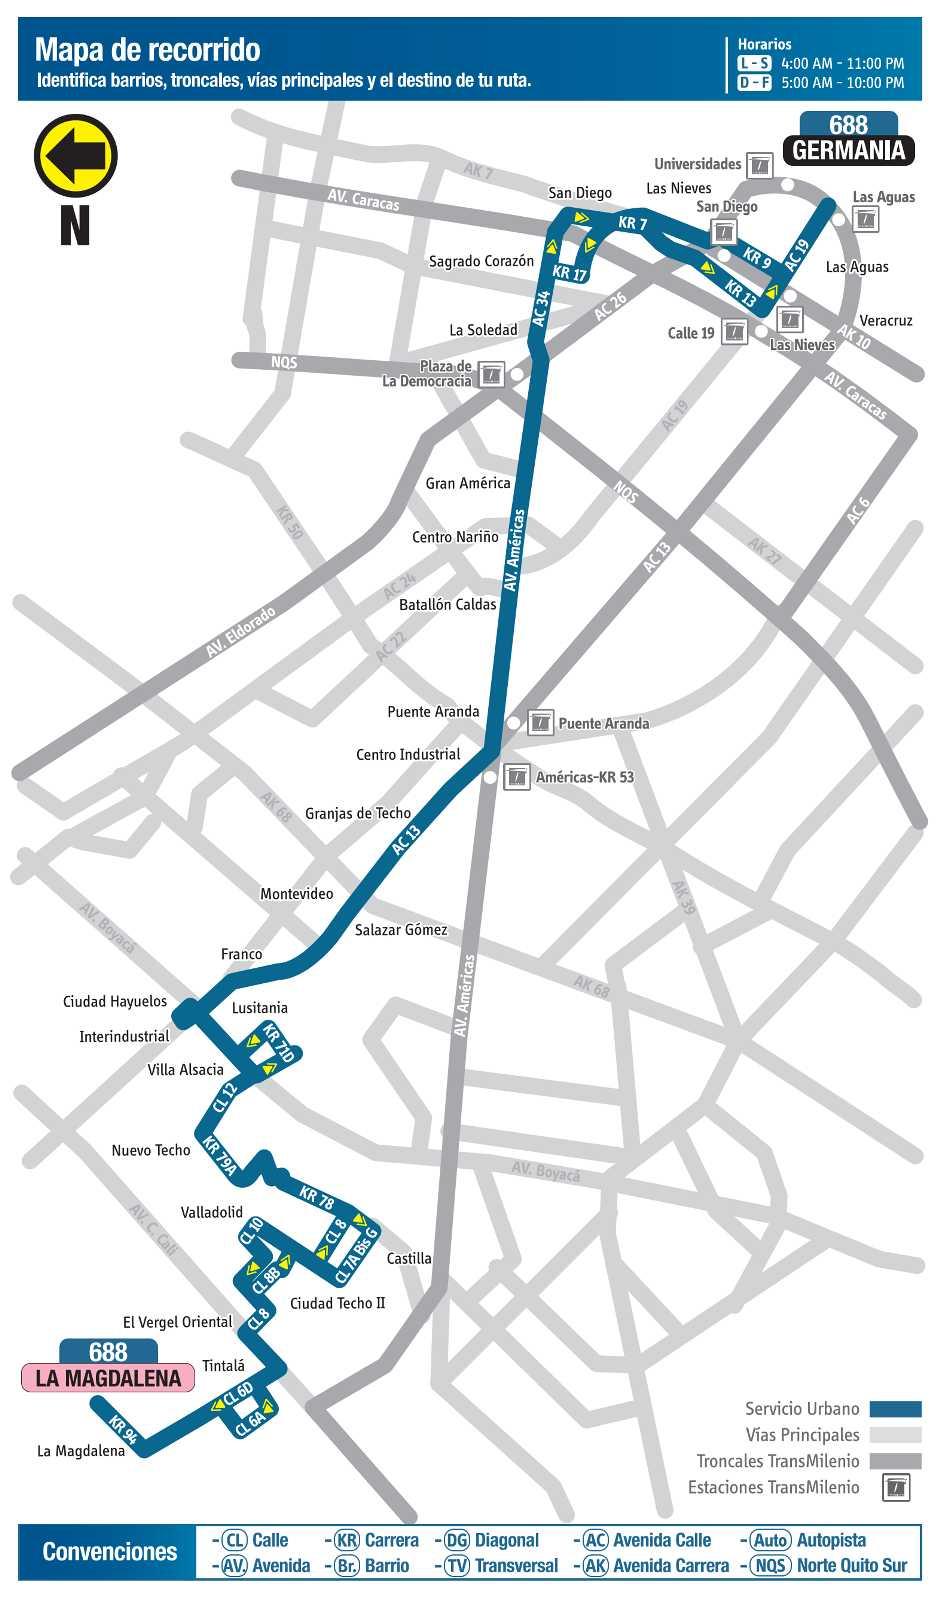 Ruta SITP: 688 La Magdalena ↔ Germania (mapa)